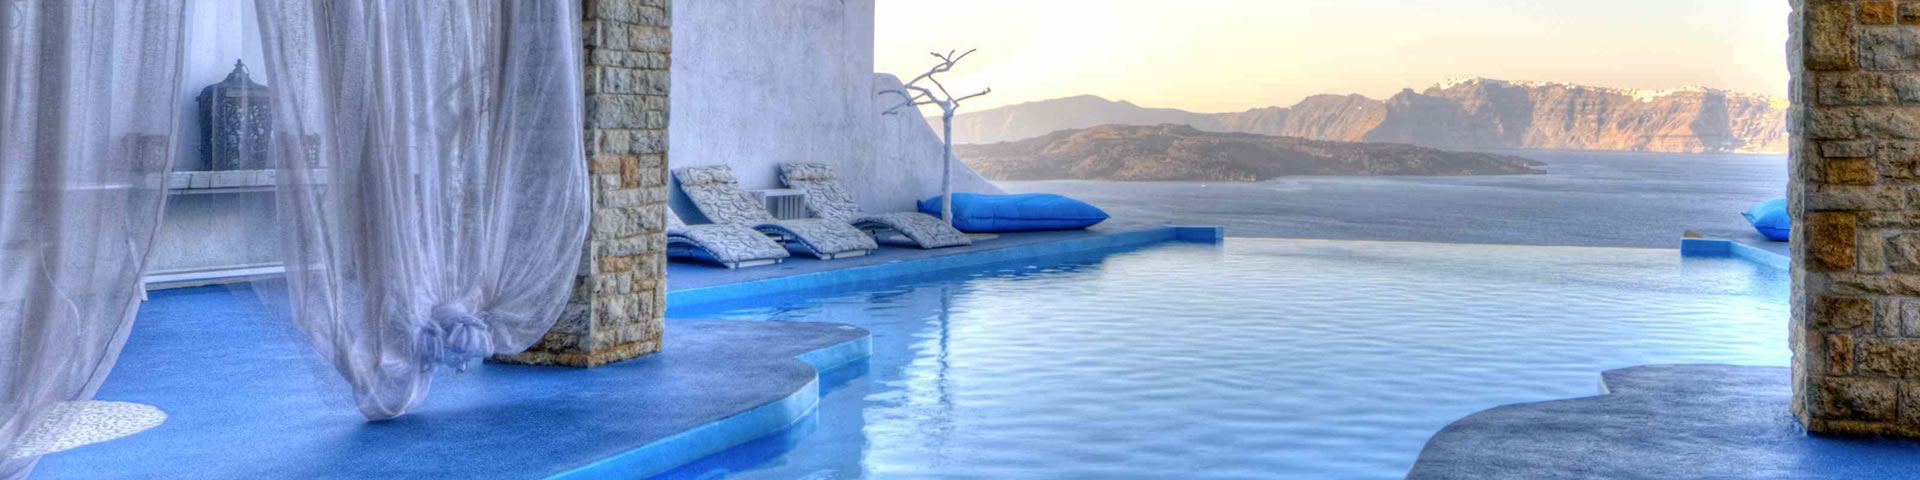 Santorini accommodation, luxury hotels